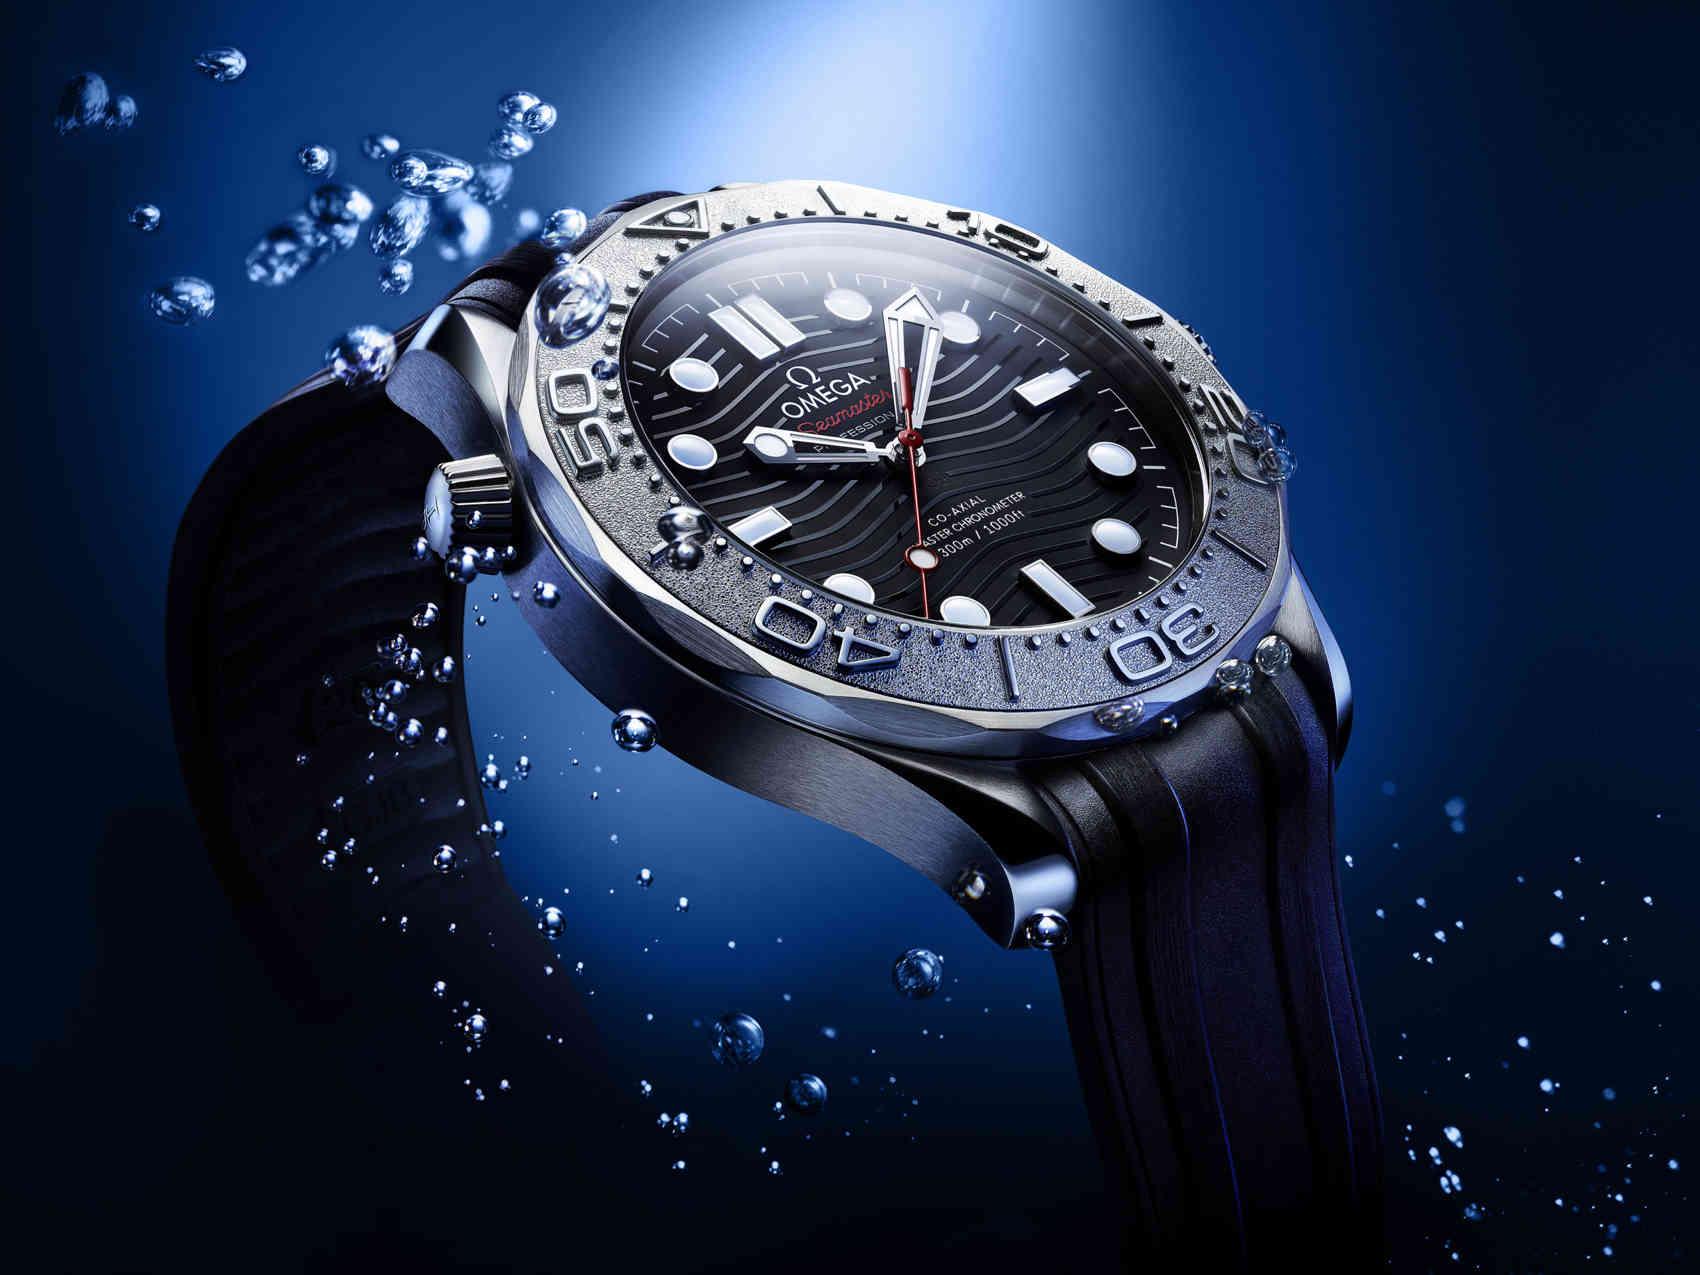 Omega Seamaster Diver 300M Nekton Edition portada